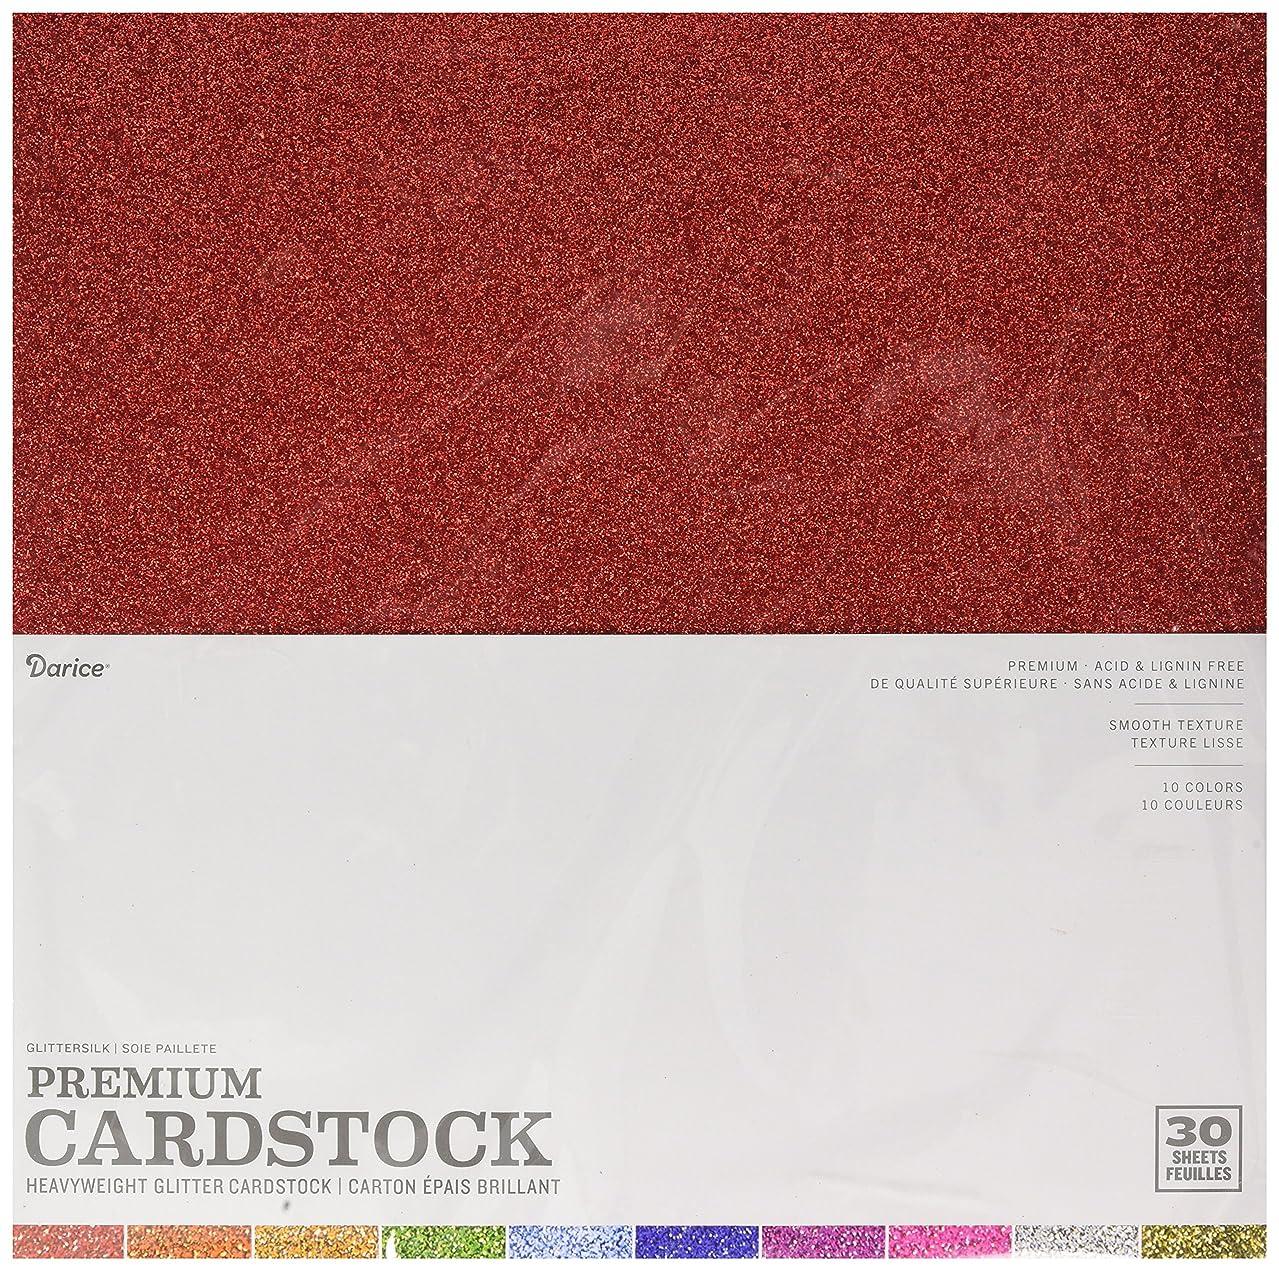 CORE'DINATIONS GX-1700-26 12 x 12 Card Stock Glitter Silk Assortment